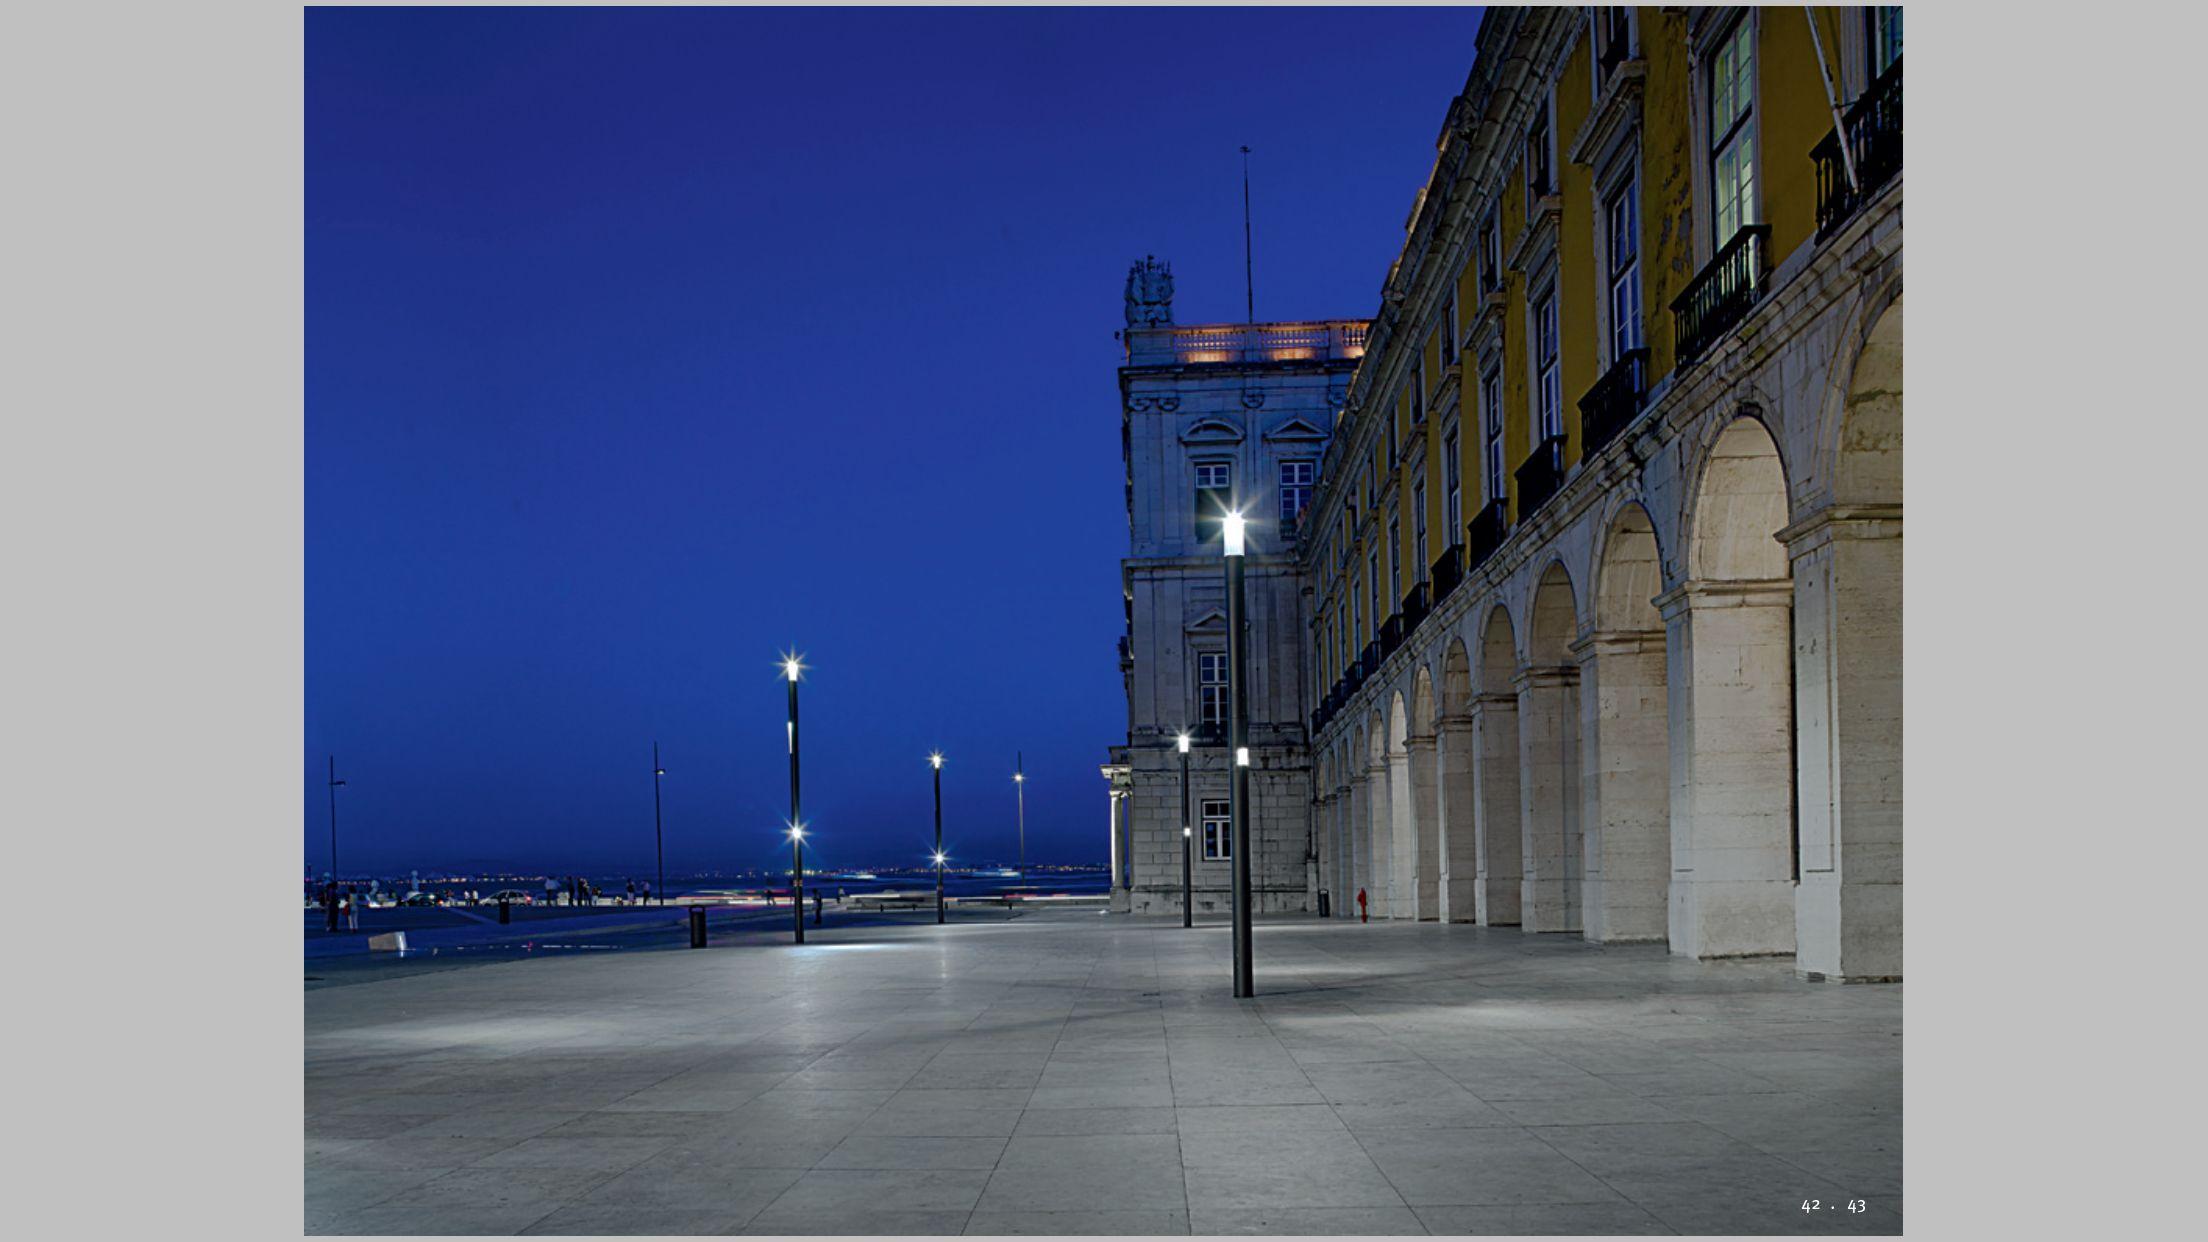 Hess city elements modular bollard street light system - Modular lighting paris ...